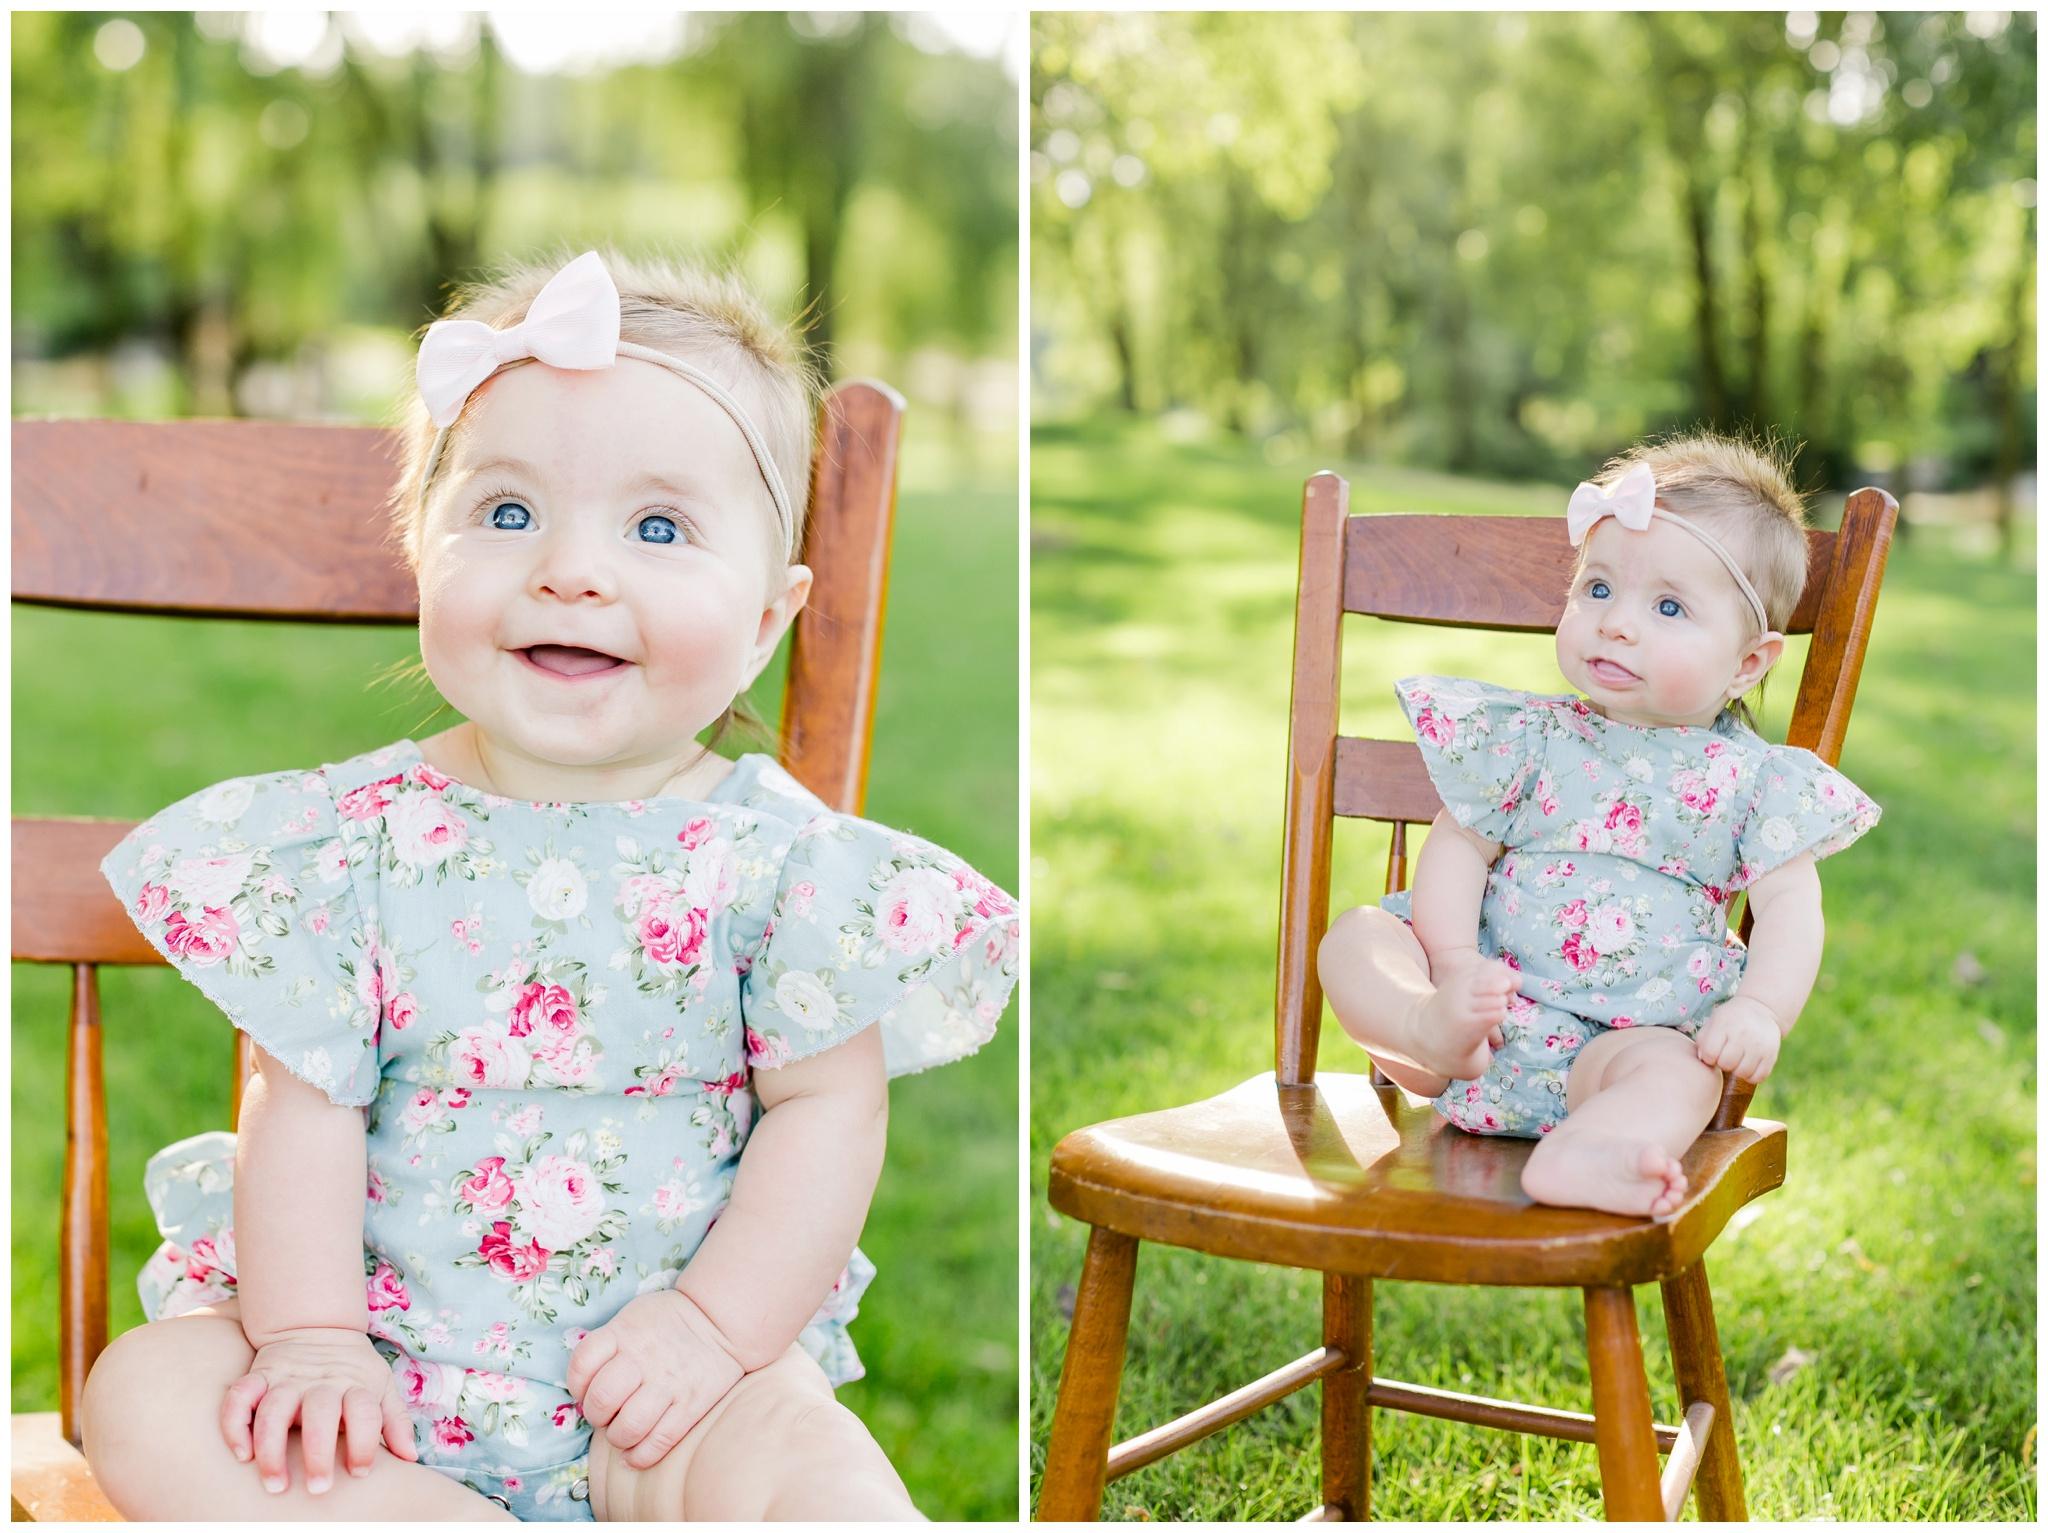 burke_park_family_session_madison_wisconsin_portrait_photographer_4524.jpg